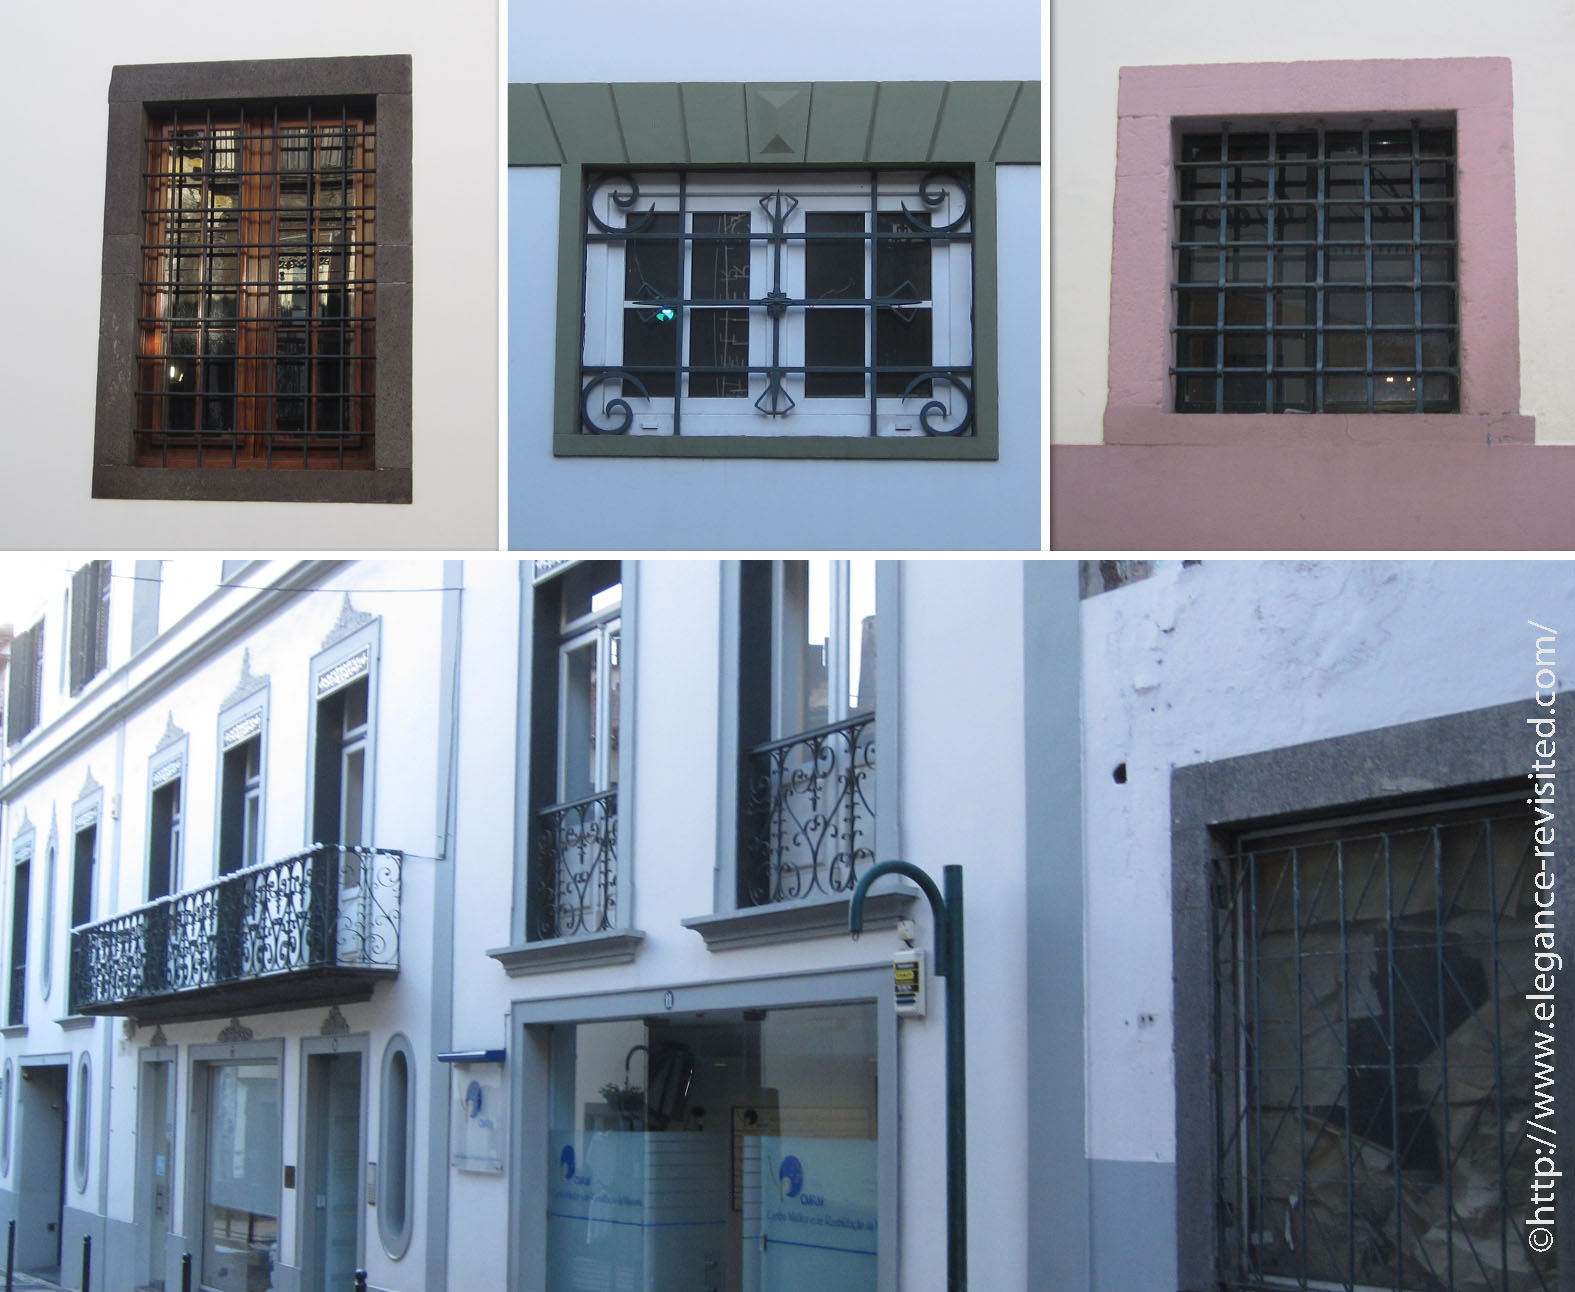 Madeira architecture